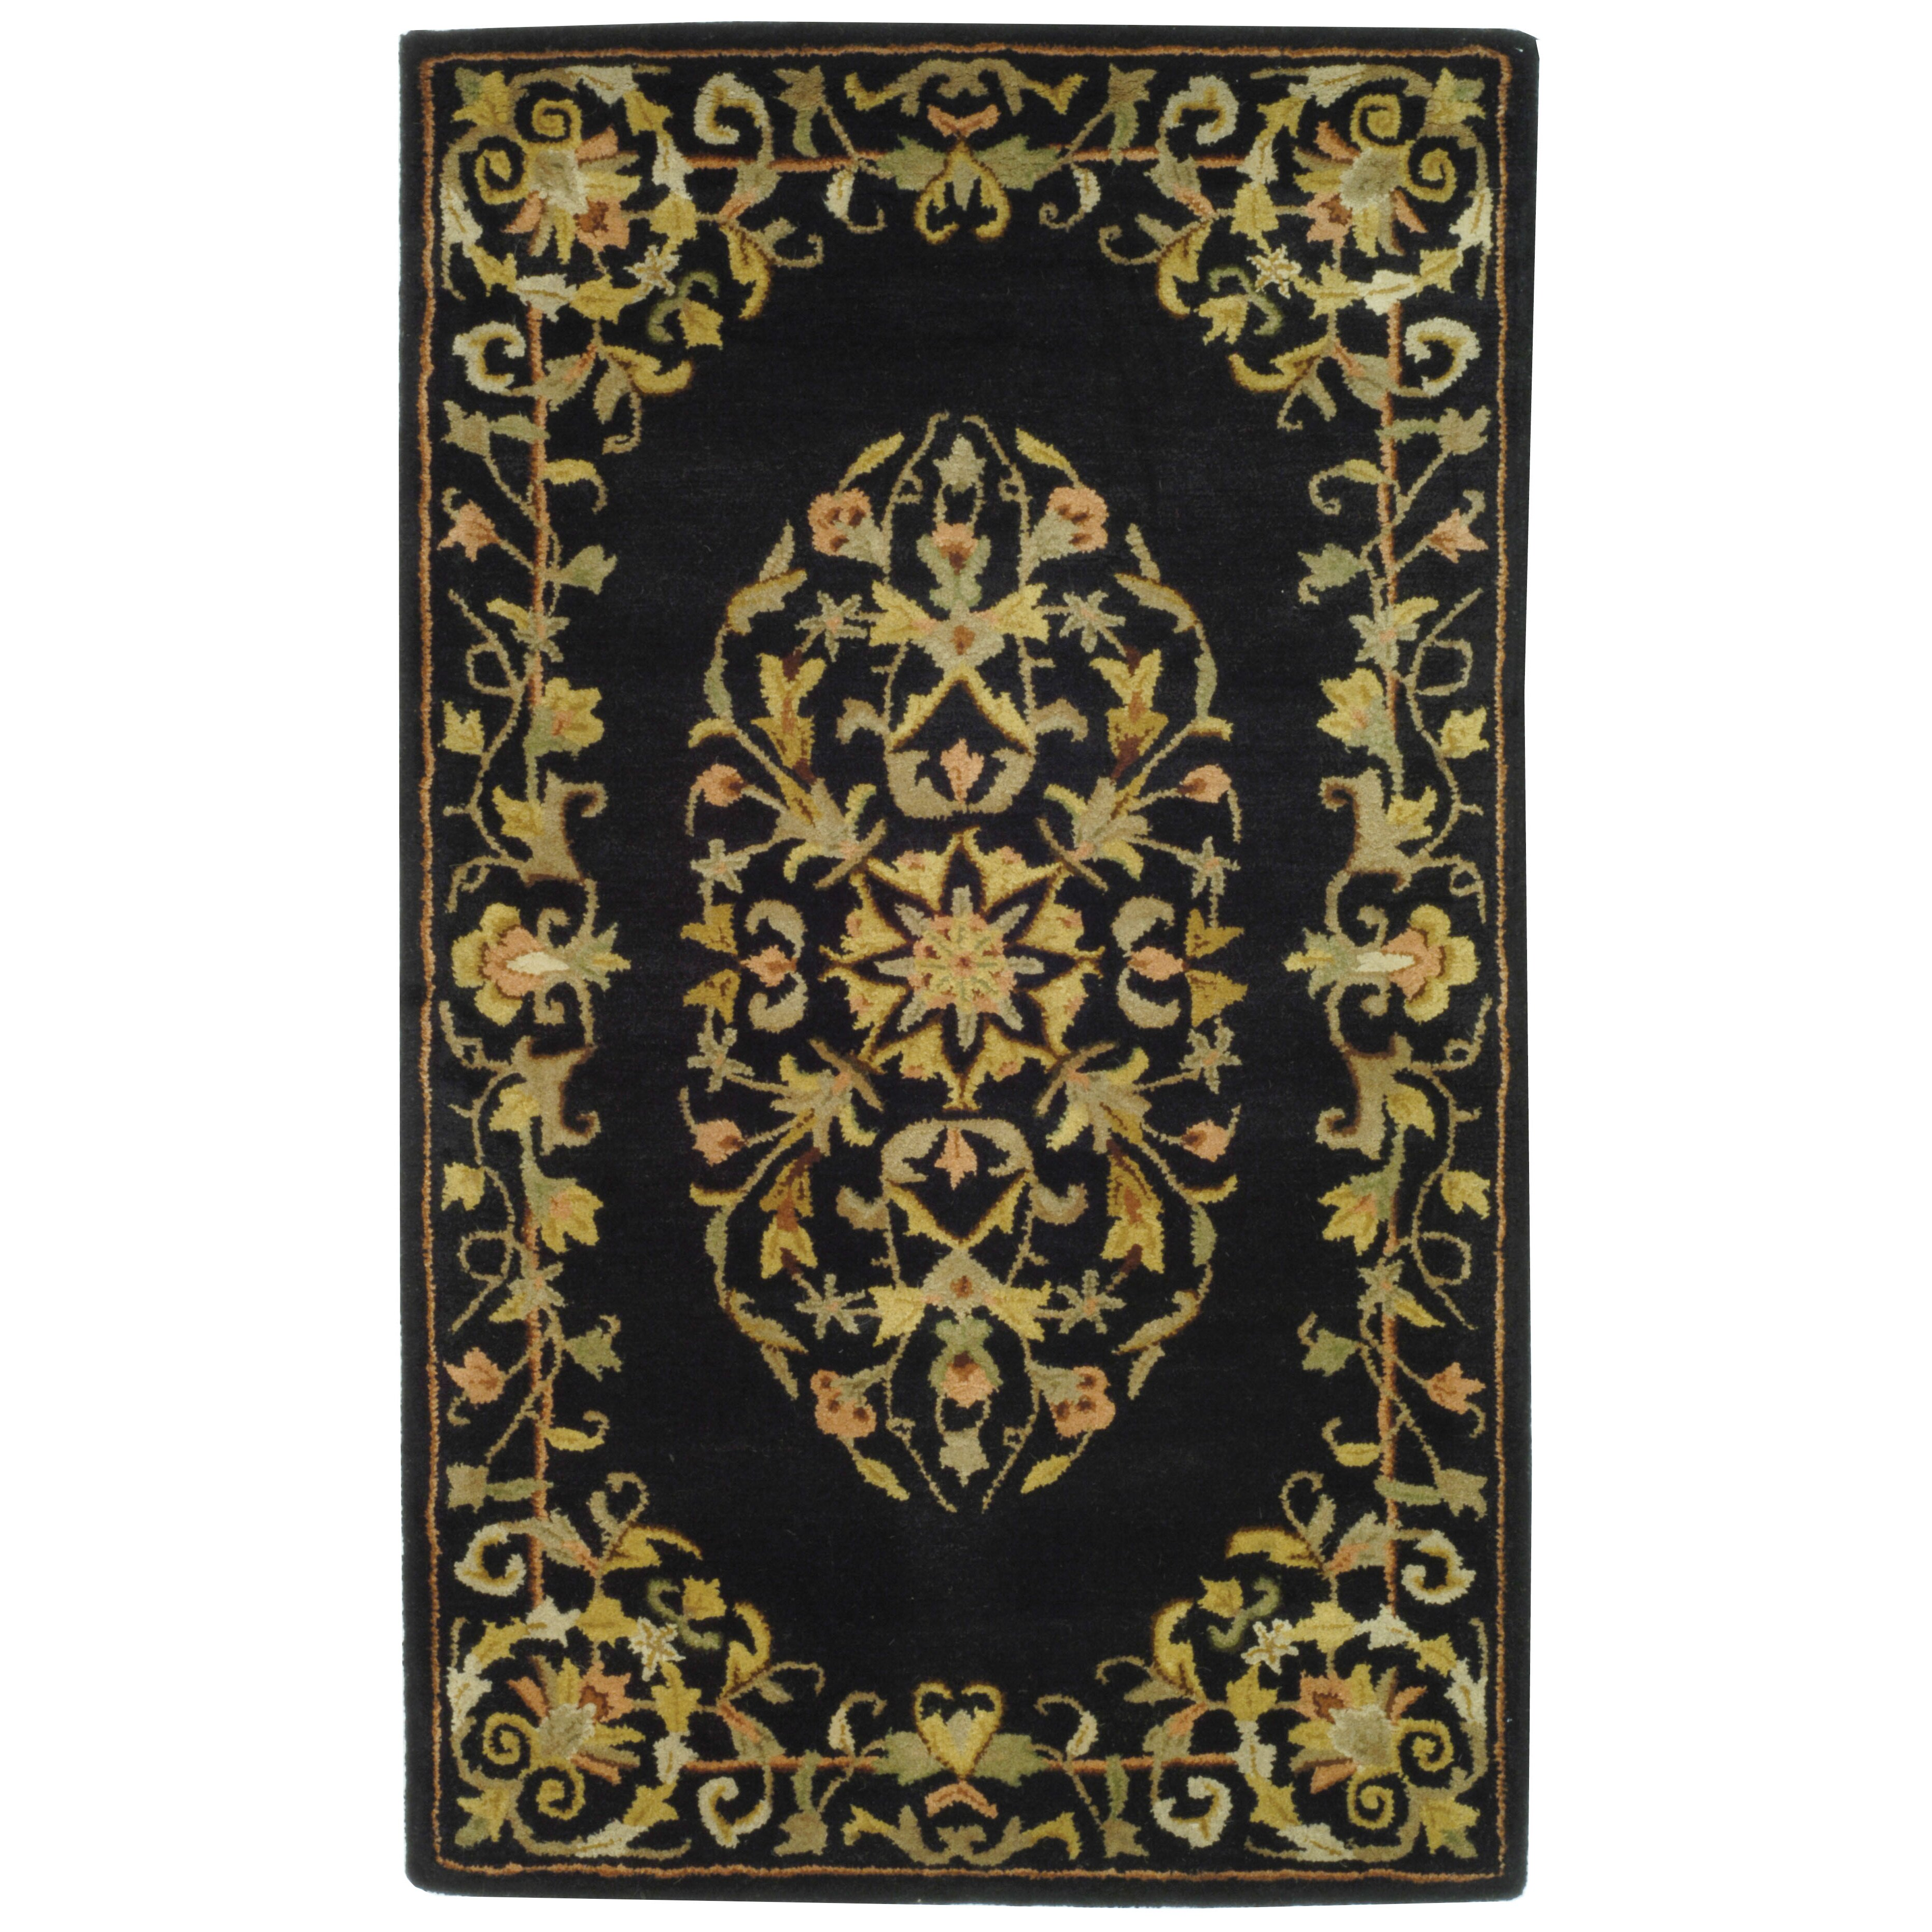 rugs area rugs runner area rugs safavieh sku fv14848